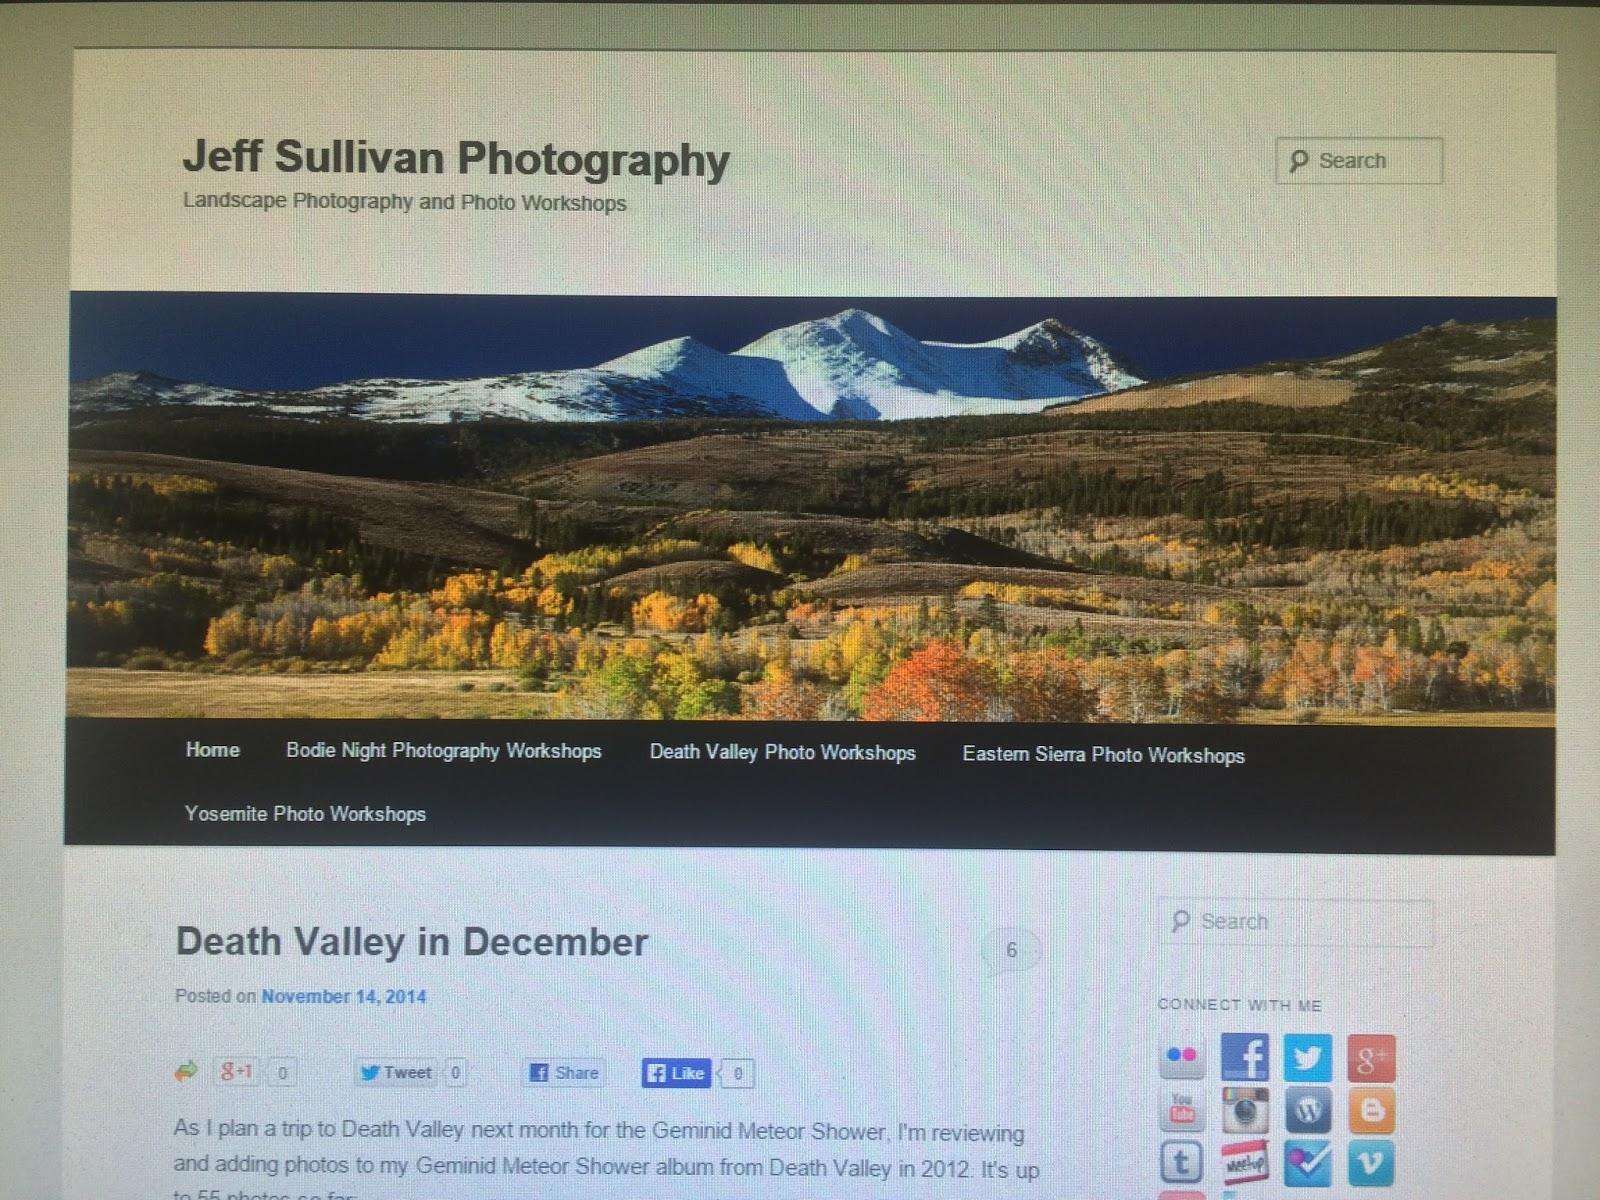 www.JeffSullivanPhotography.com